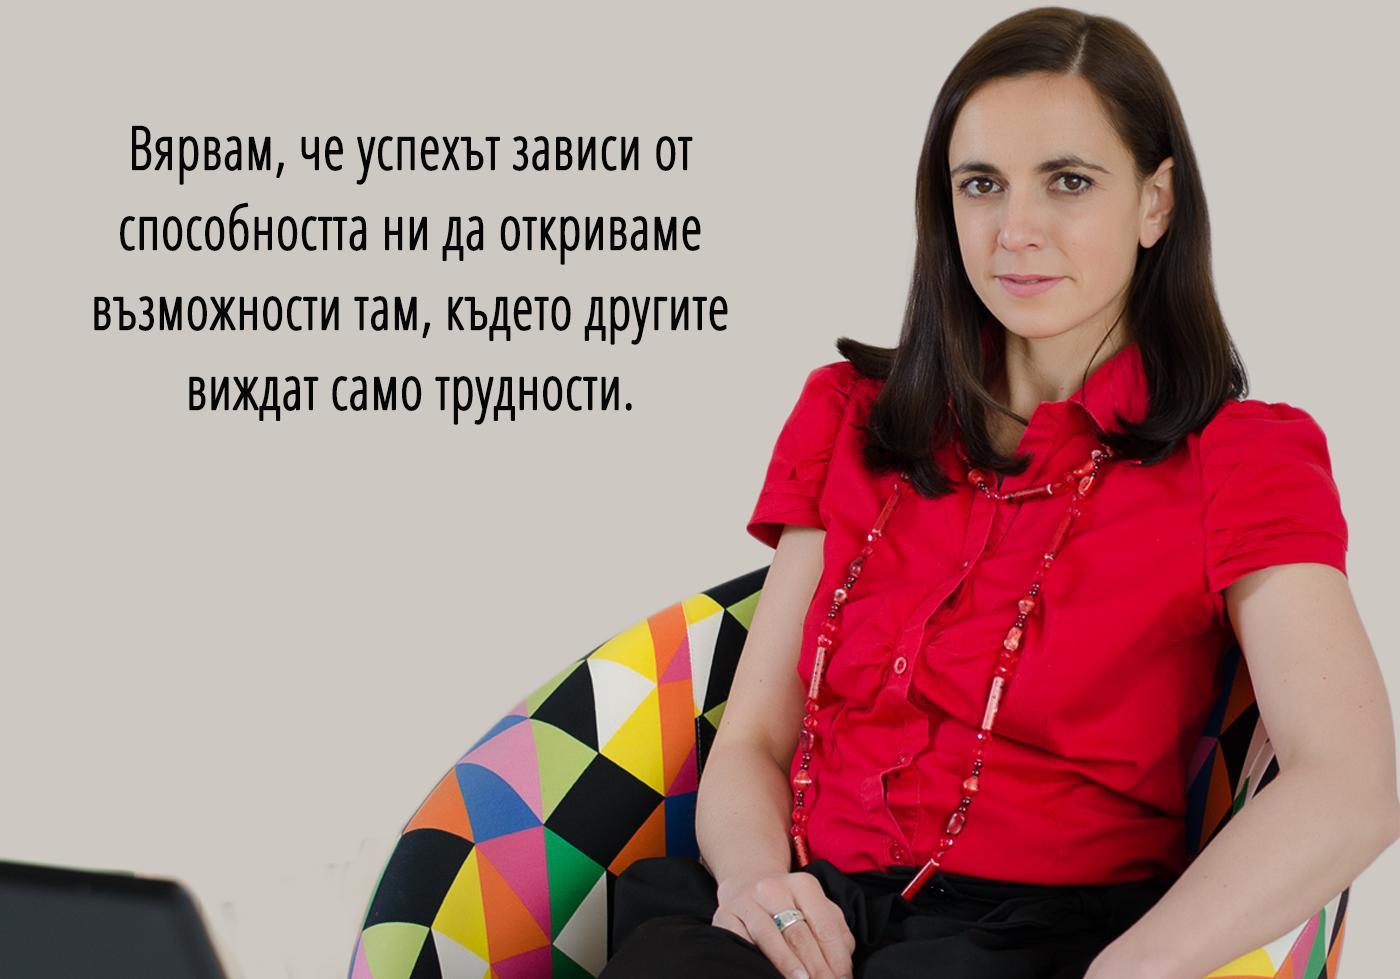 Деница Илчева